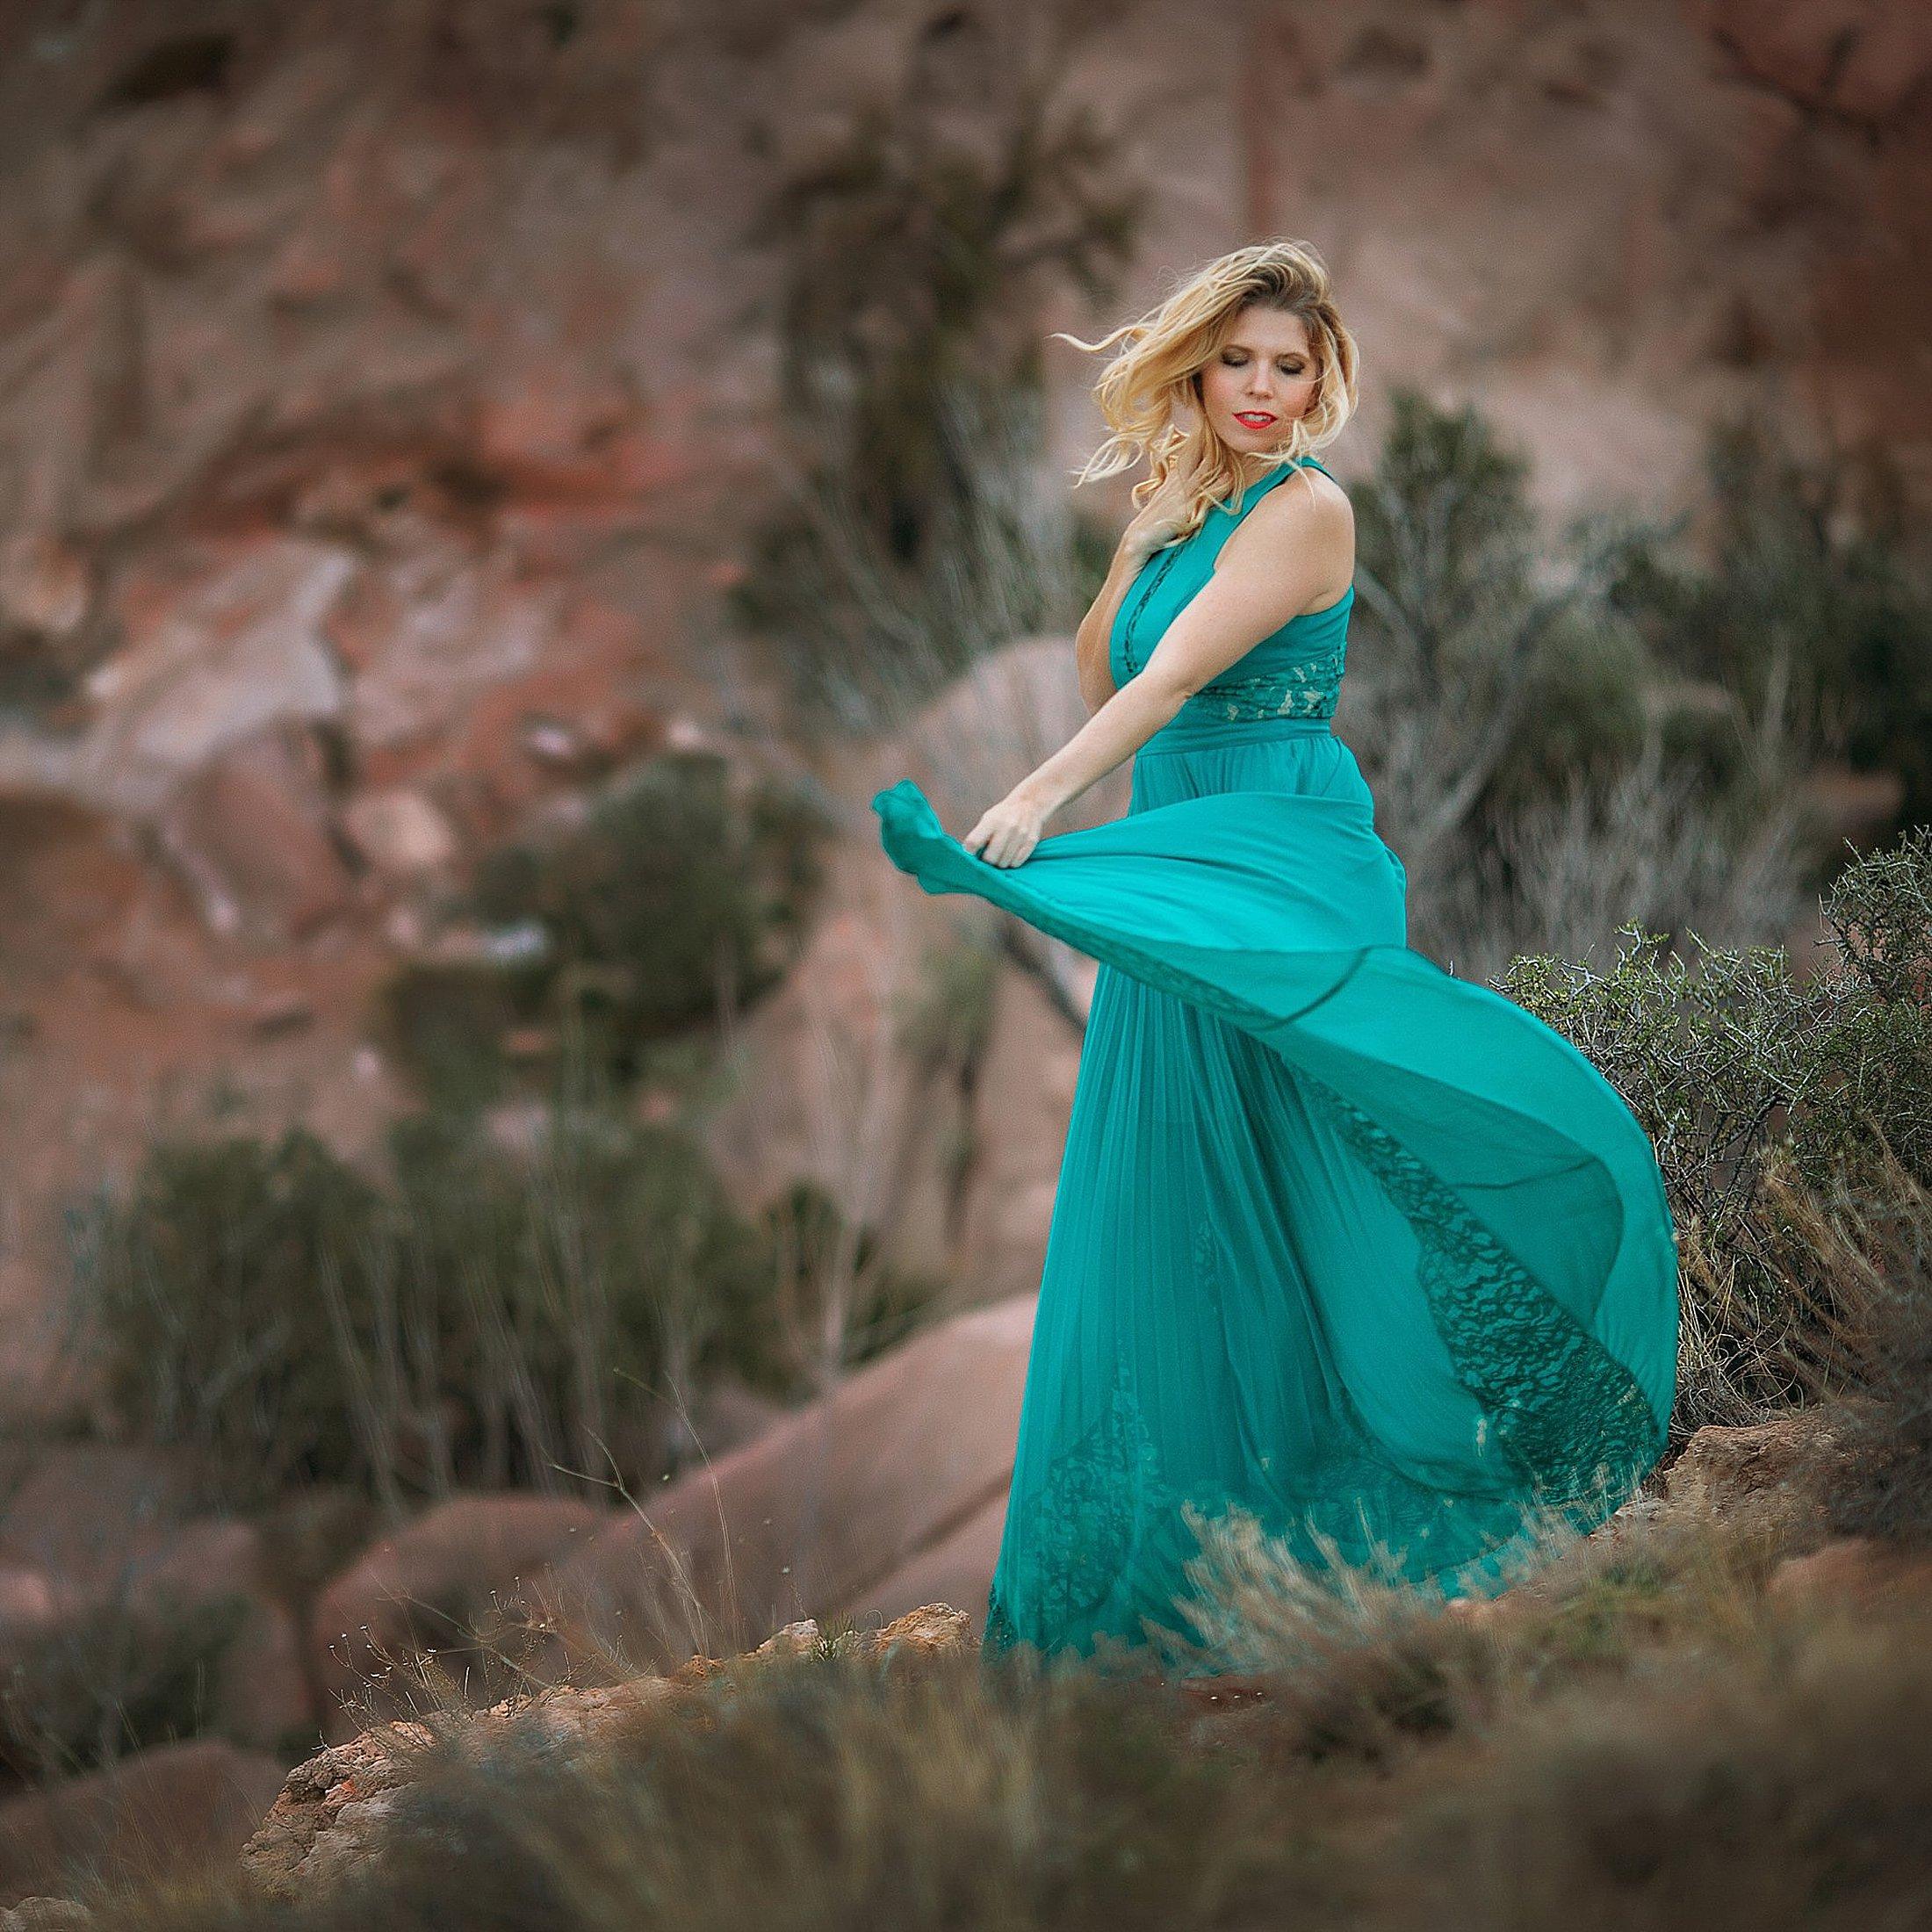 MKPhoto_Candice Gary-44b